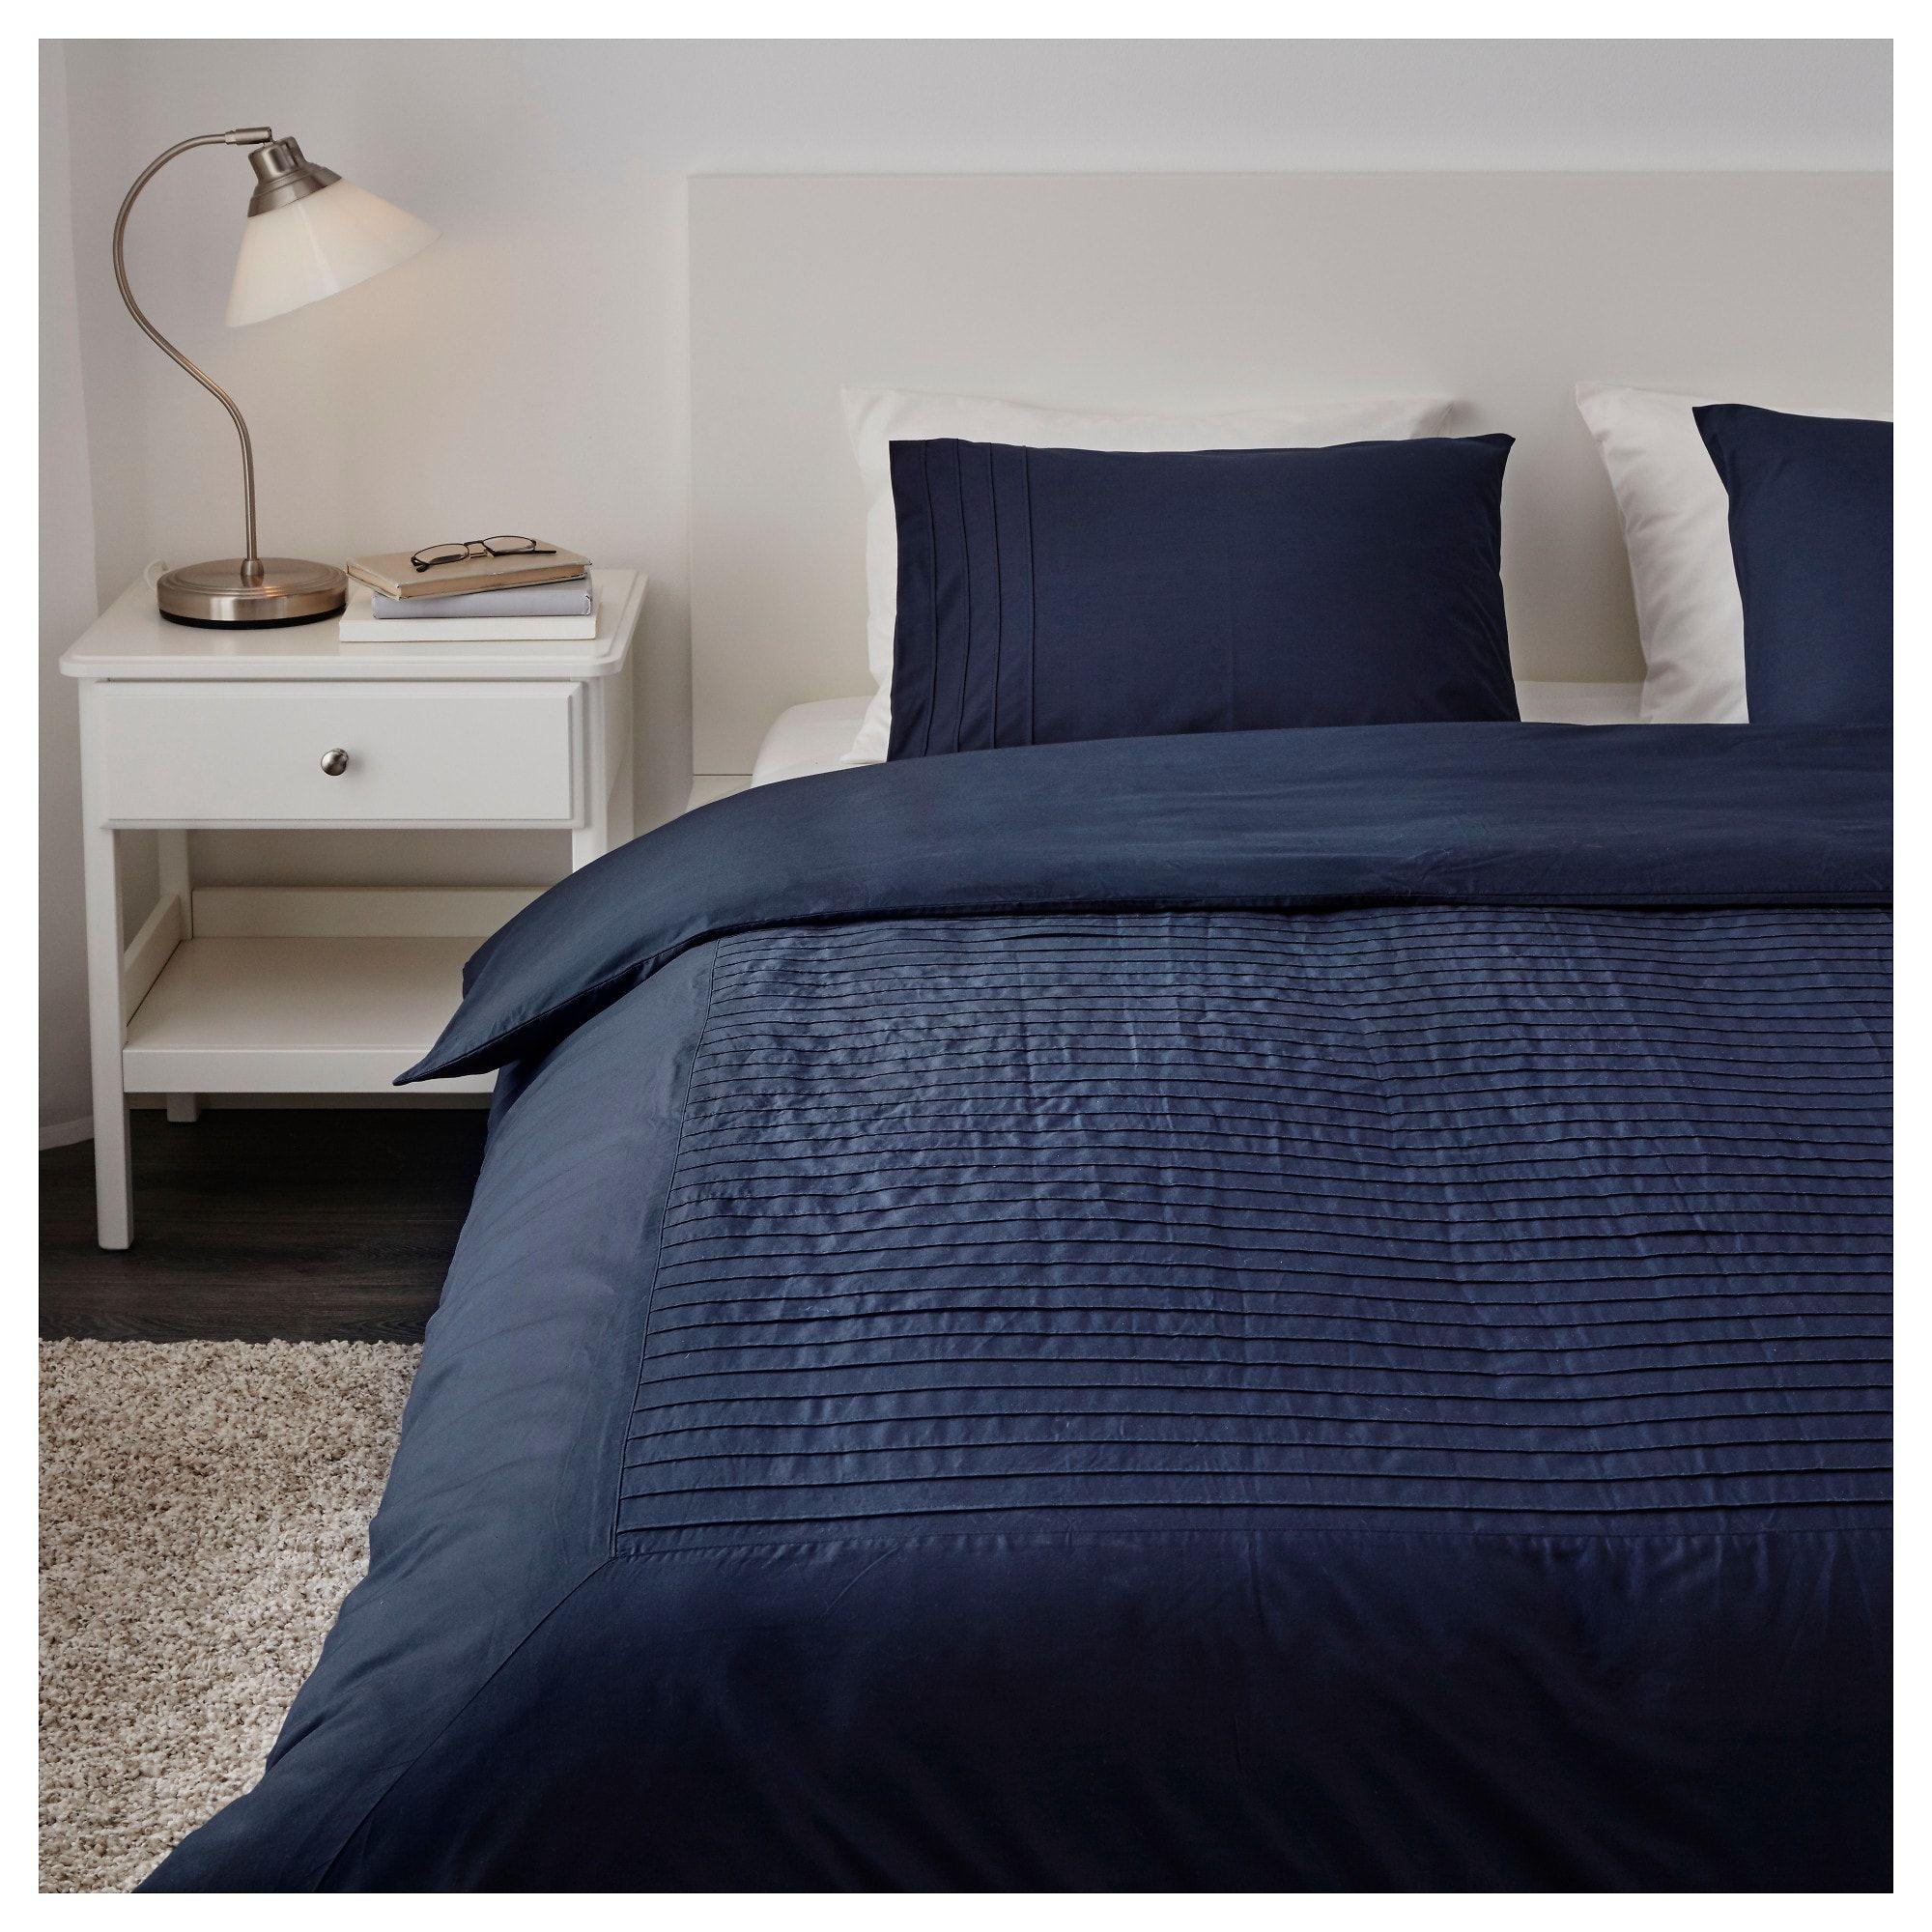 Alvine Str Quilt Cover And 2 Pillowcases Blue 200X20050X80 Cm